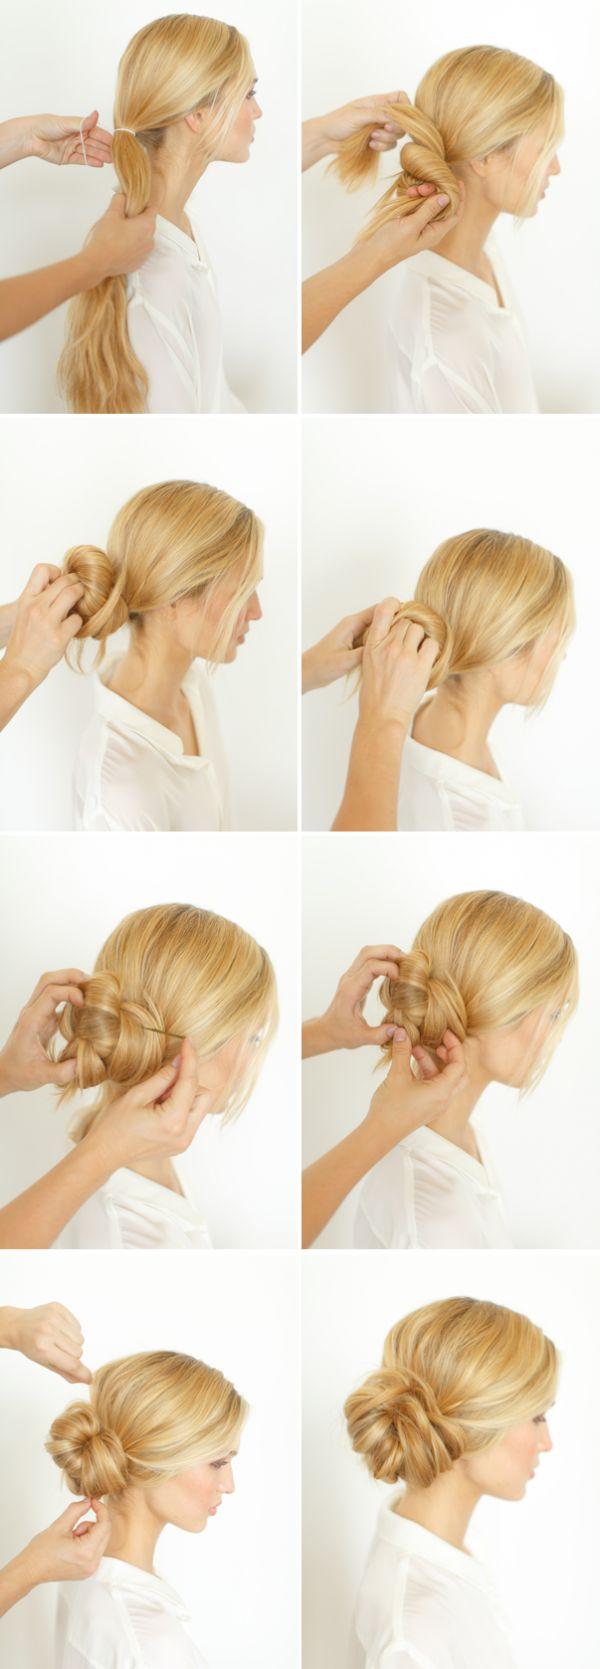 Enjoyable 1000 Ideas About Side Bun Updo On Pinterest Bun Updo Side Buns Short Hairstyles Gunalazisus